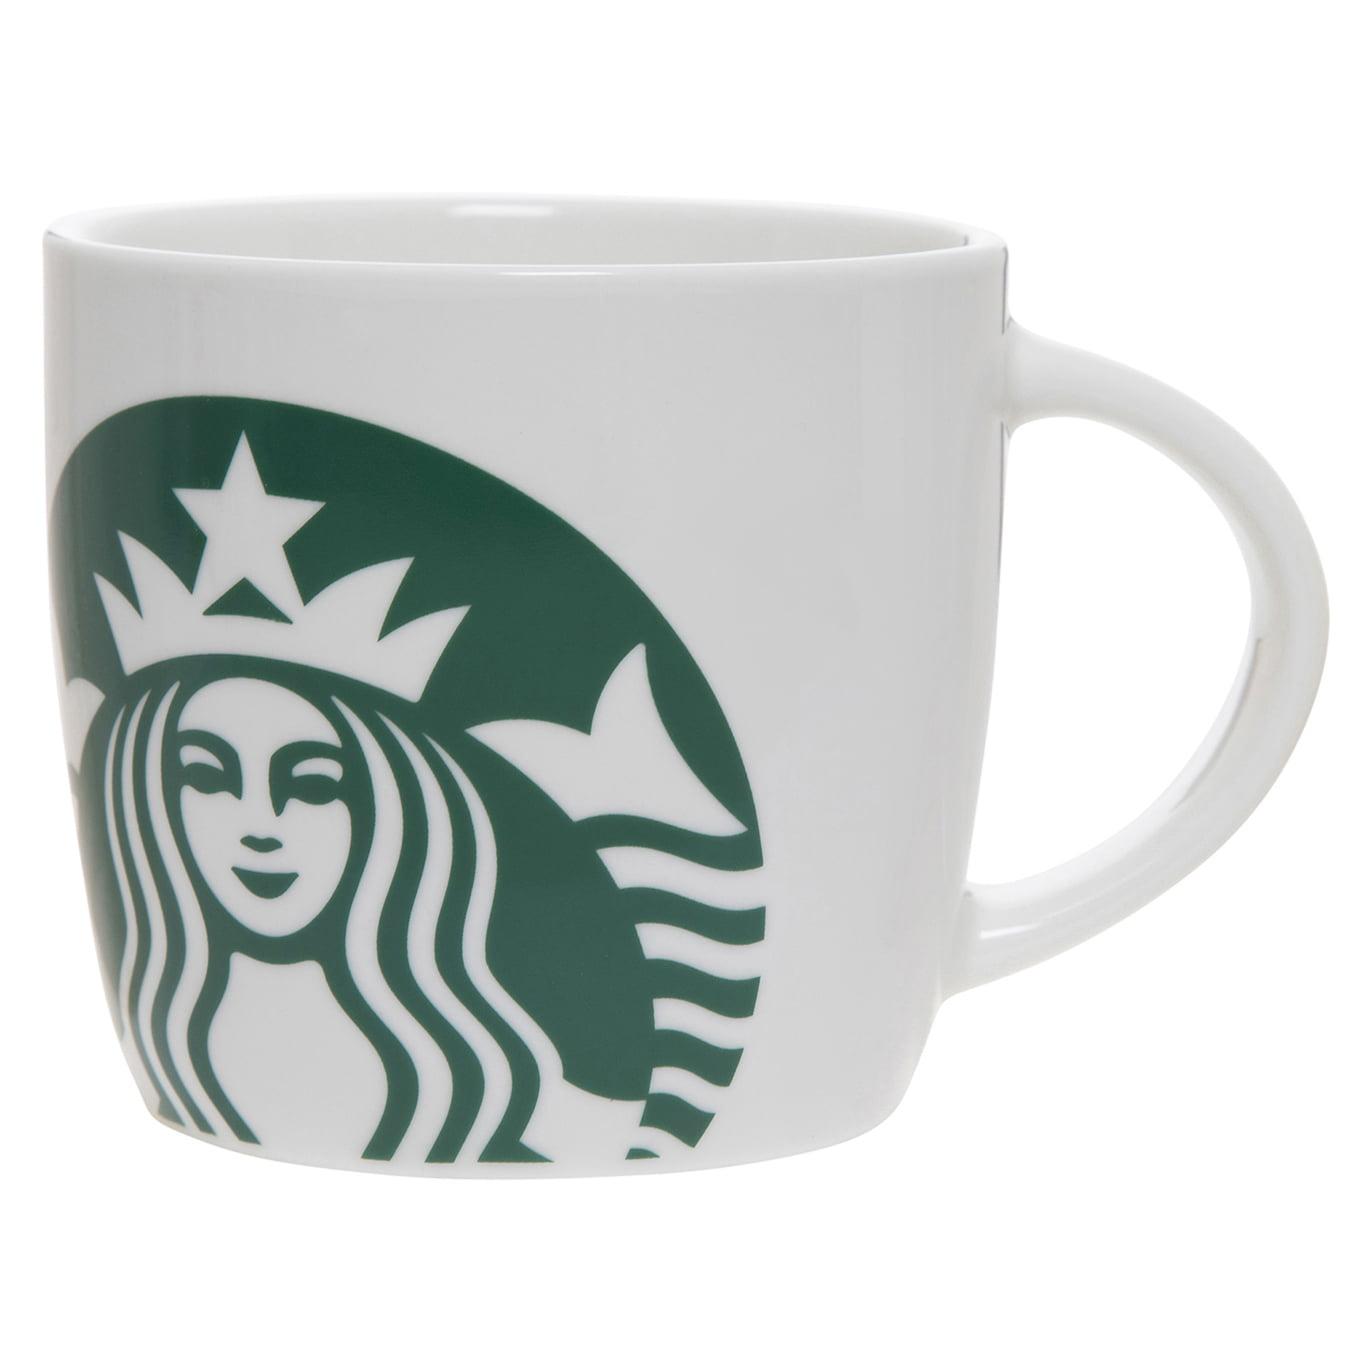 Starbucks 14oz White Ceramic Mug Walmart Com Walmart Com